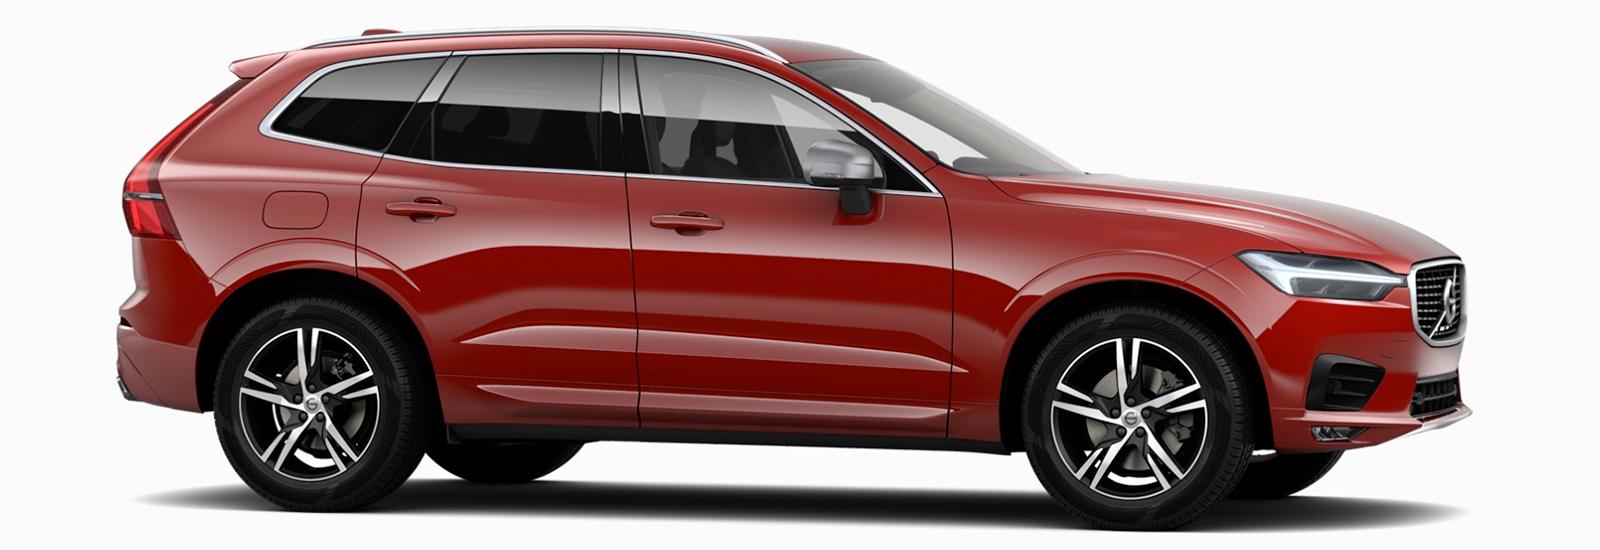 Volvo Xc60 Colours | 2018 Volvo Reviews